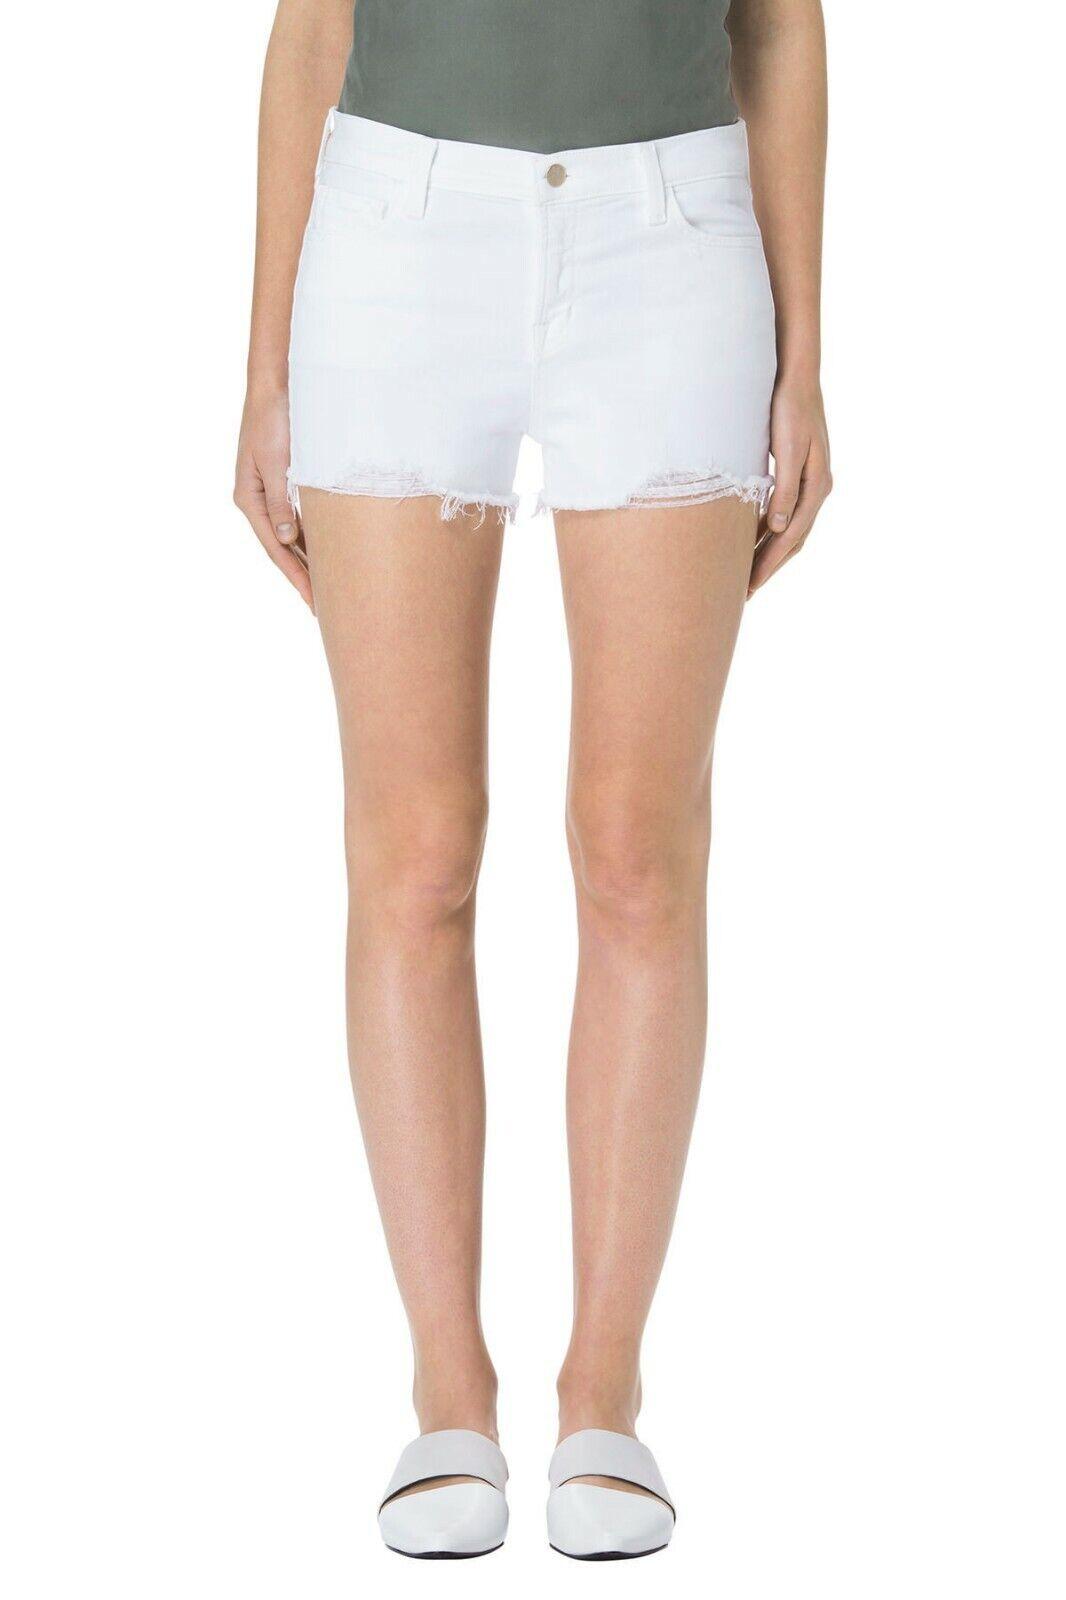 NWT J Brand 1044 Mid-Rise Shorts w. Raw Hem, Razed white (White) Size 26